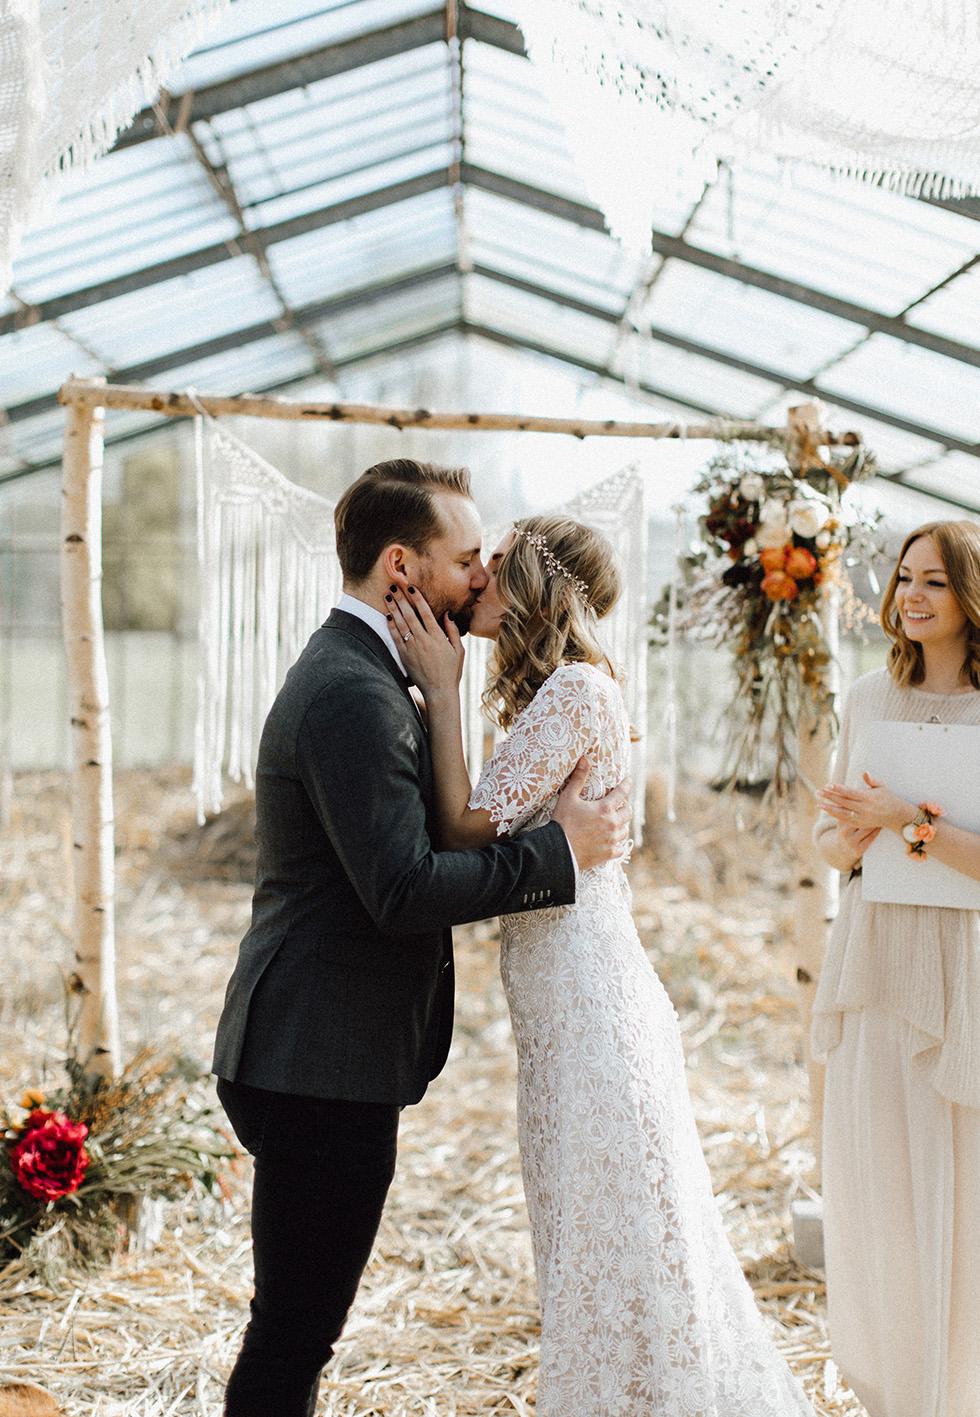 Traumanufaktur_Schloss_Diersford_Bohemian_Wedding_Boho_Hochzeit_Hochzeitsfotograf_053.jpg